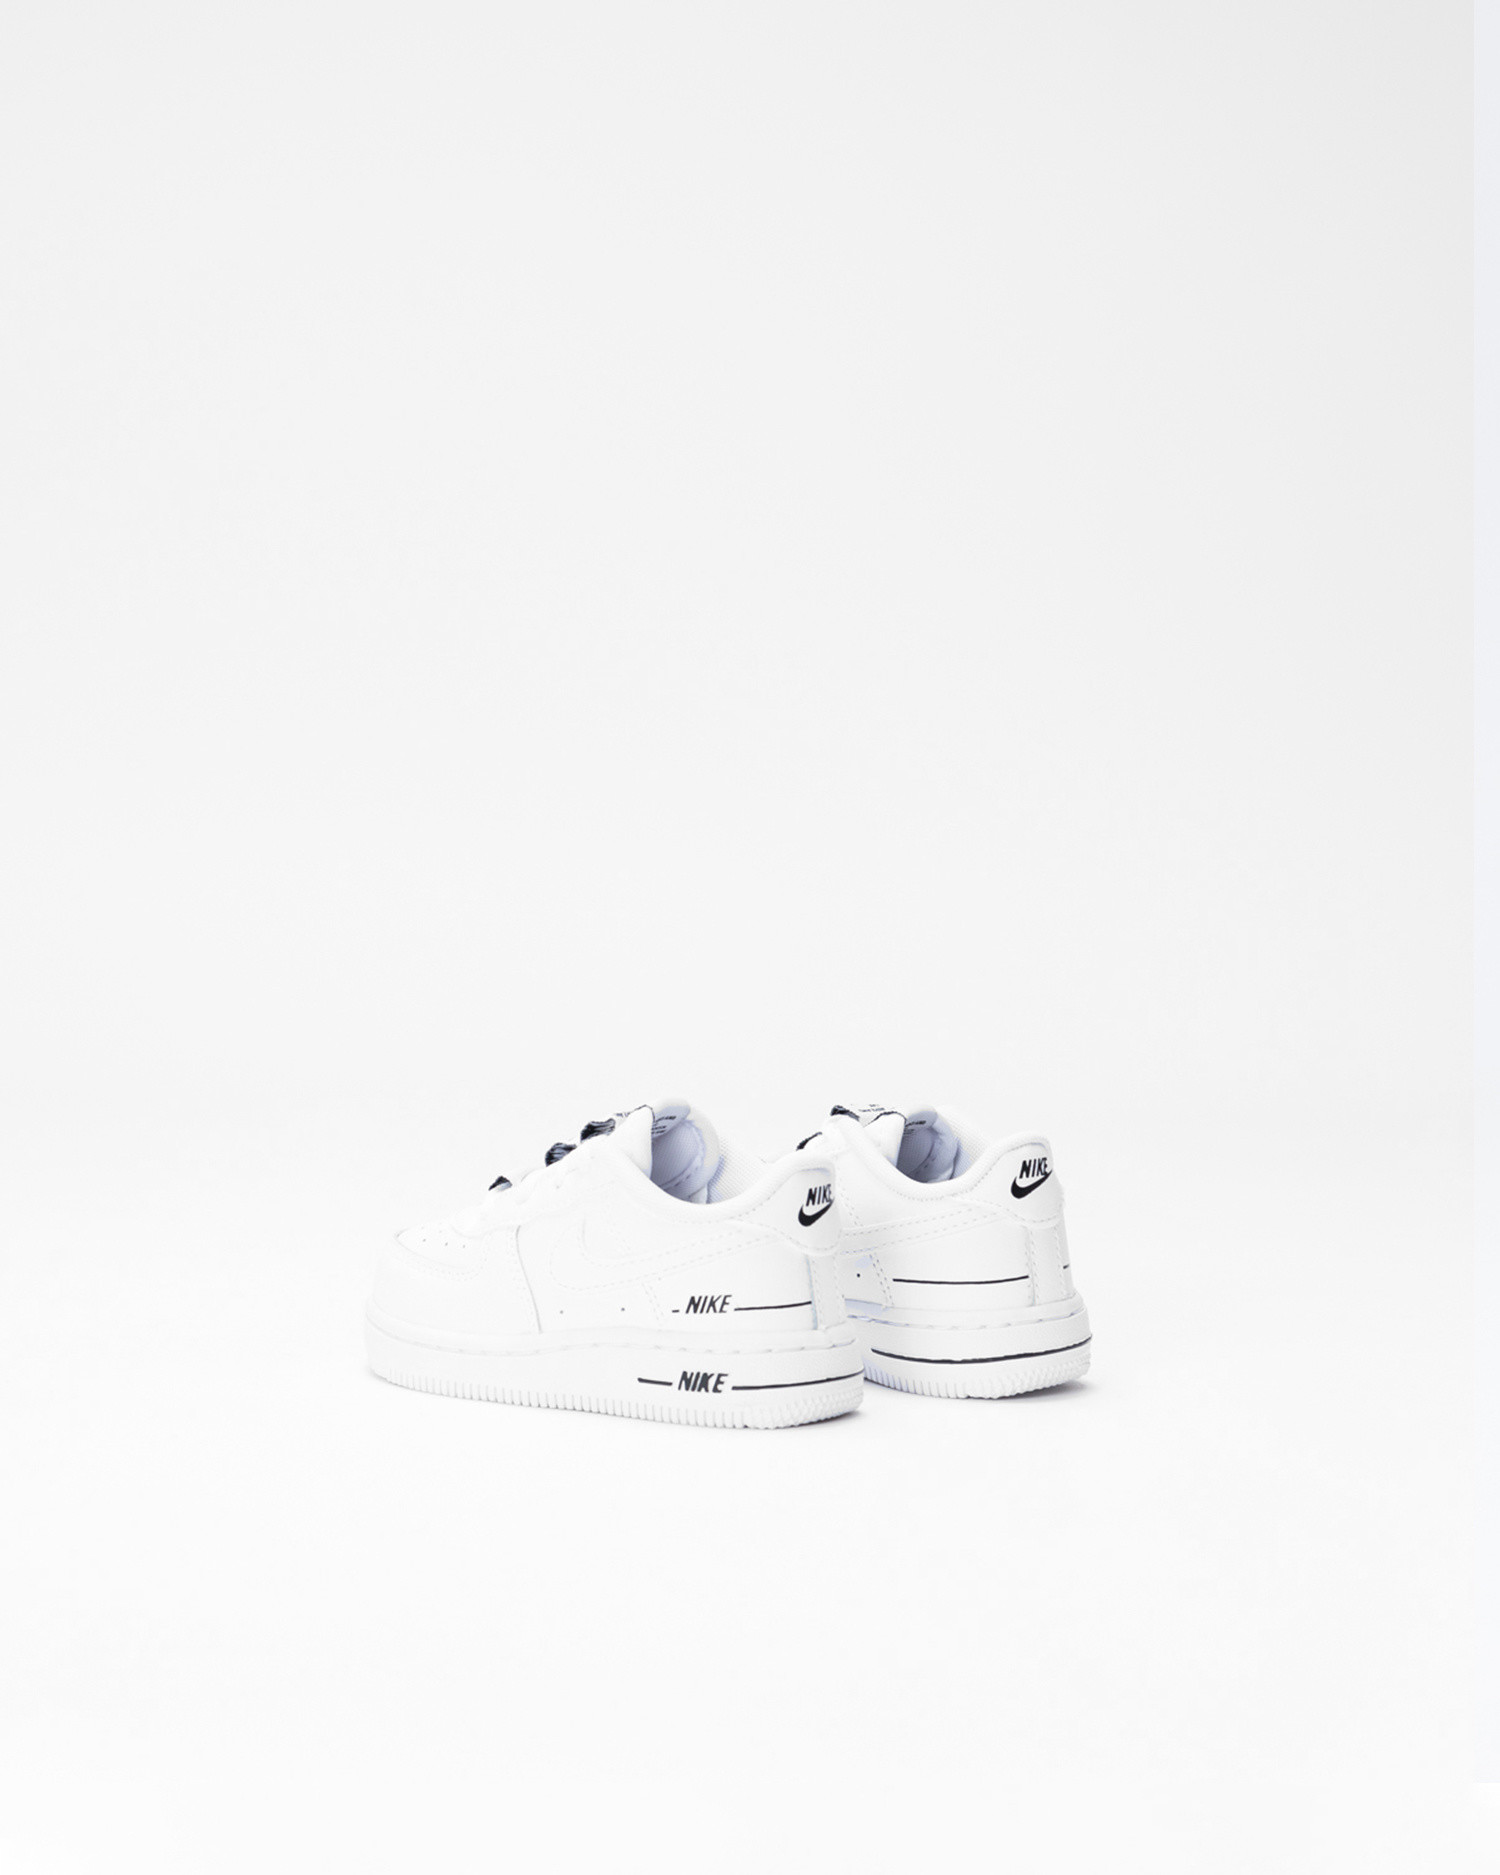 Nike Force 1 LV8 3 White/White-Black